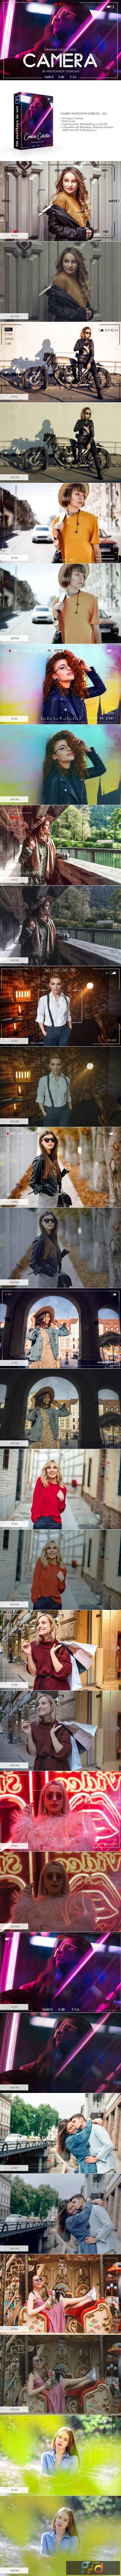 Camera Photoshop Overlays 4723761 1